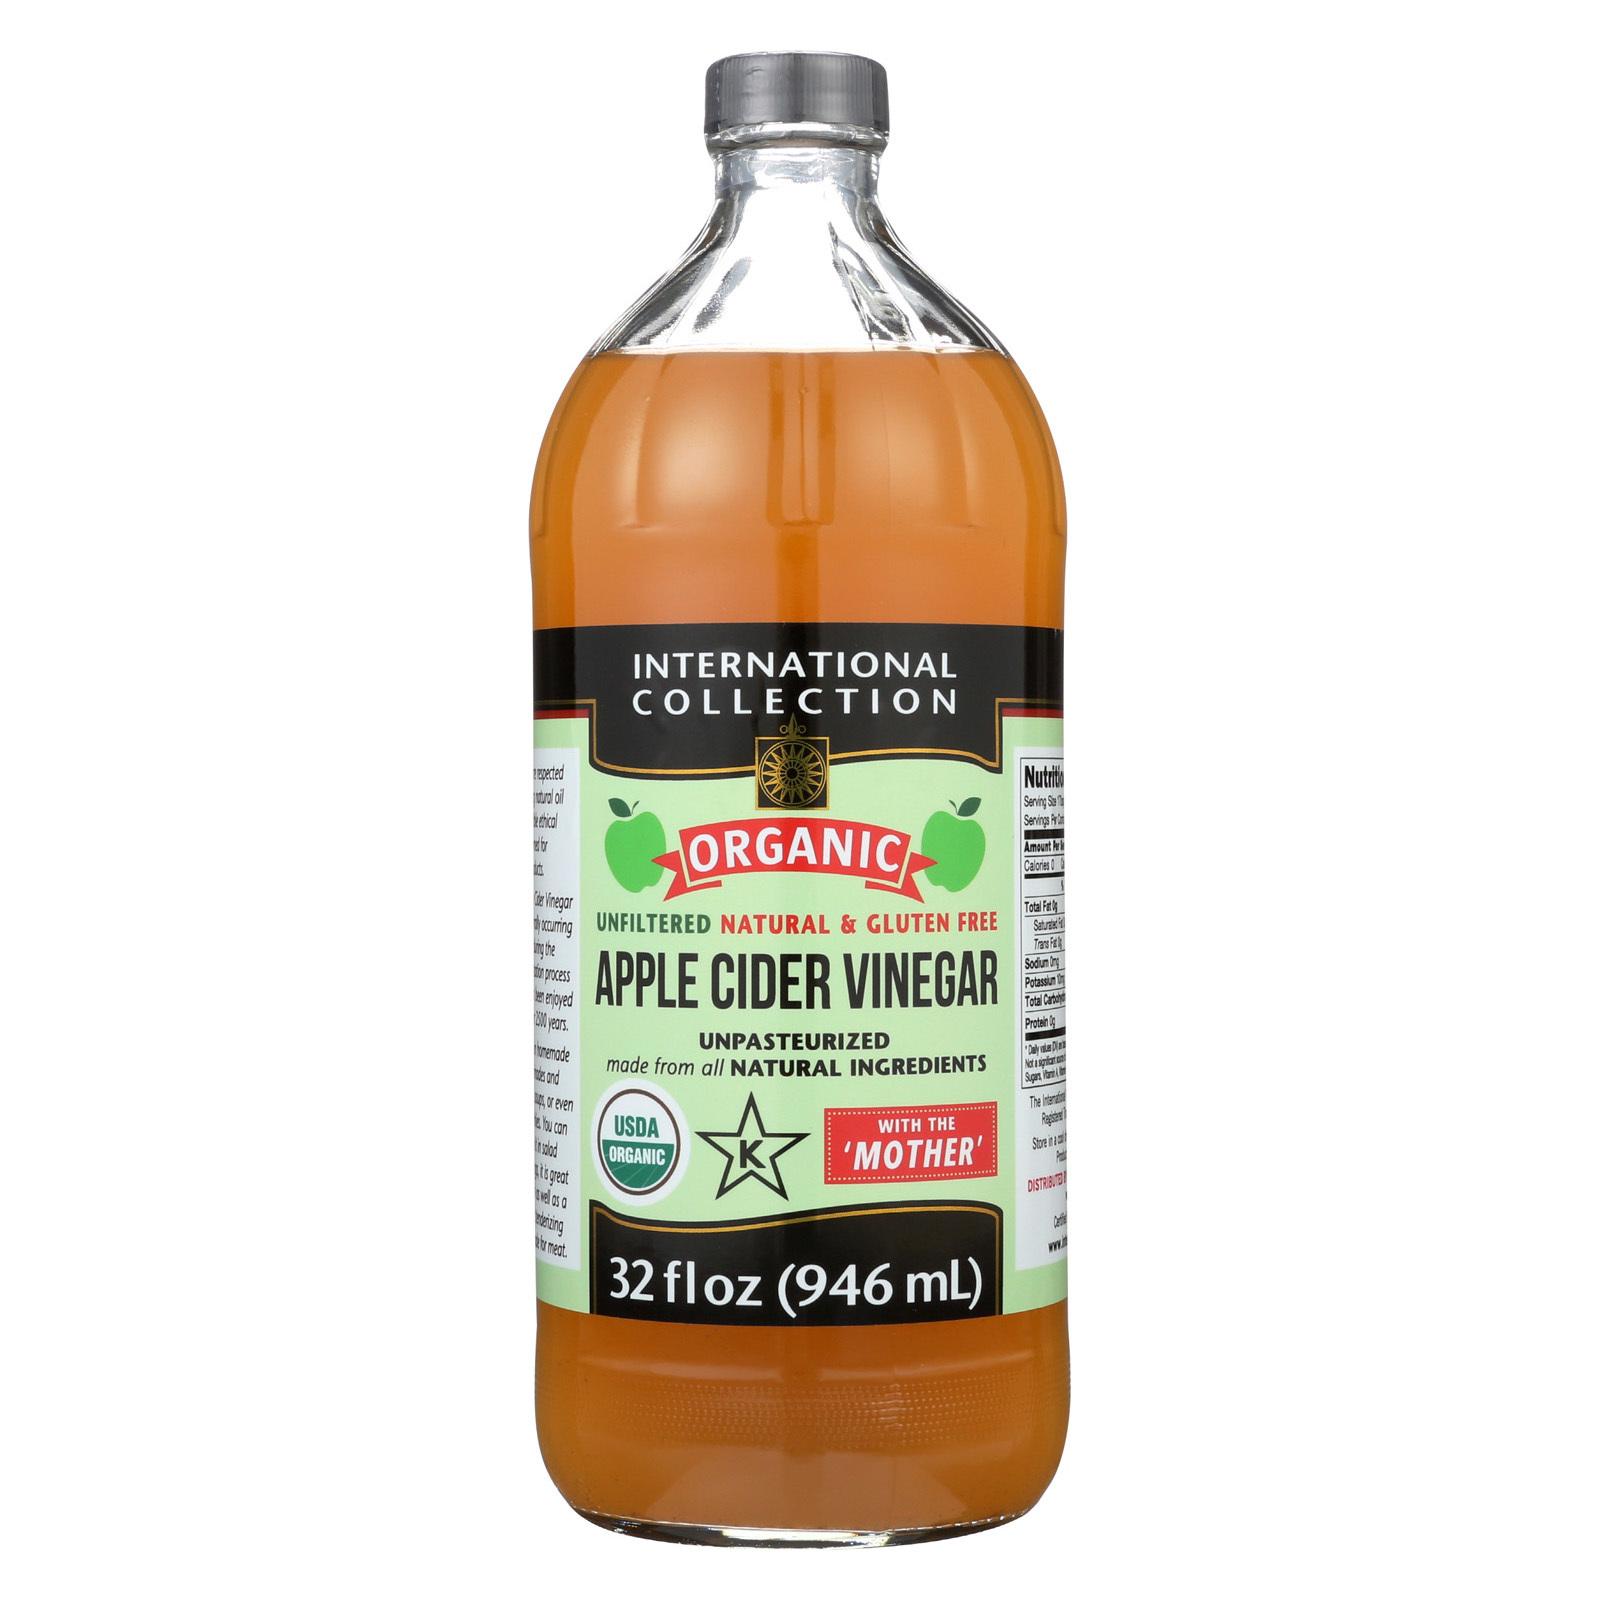 International Collection Vinegar - Organic - Apple Cider - Case of 6 - 32 fl oz